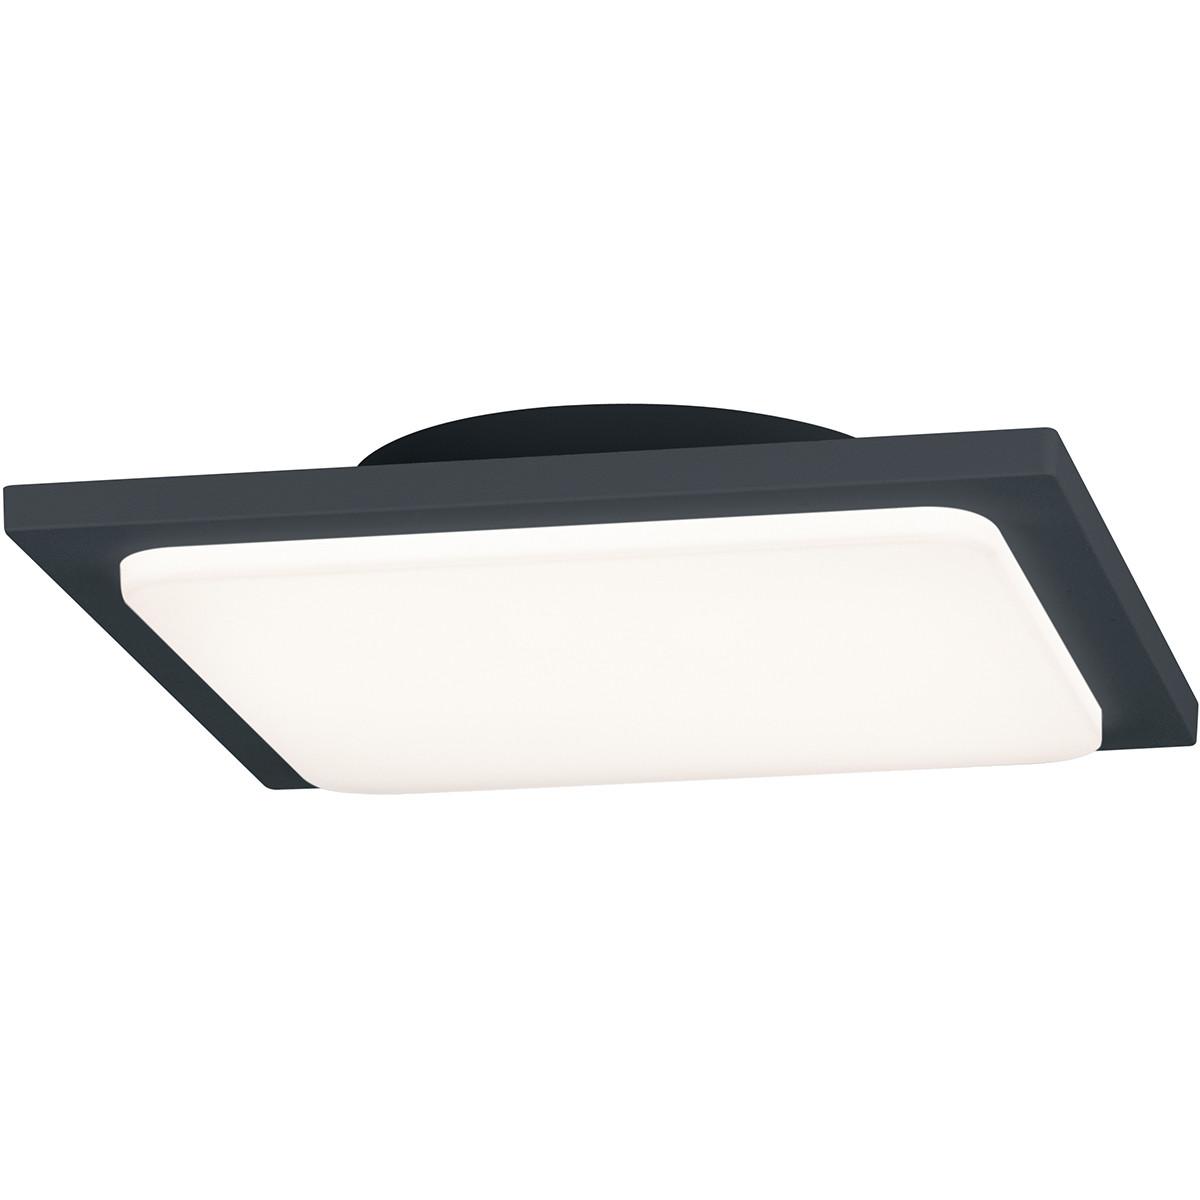 LED Plafondlamp - Trion Tovery - Opbouw Vierkant 18W - Waterdicht IP54 - Warm Wit 3000K - Mat Zwart